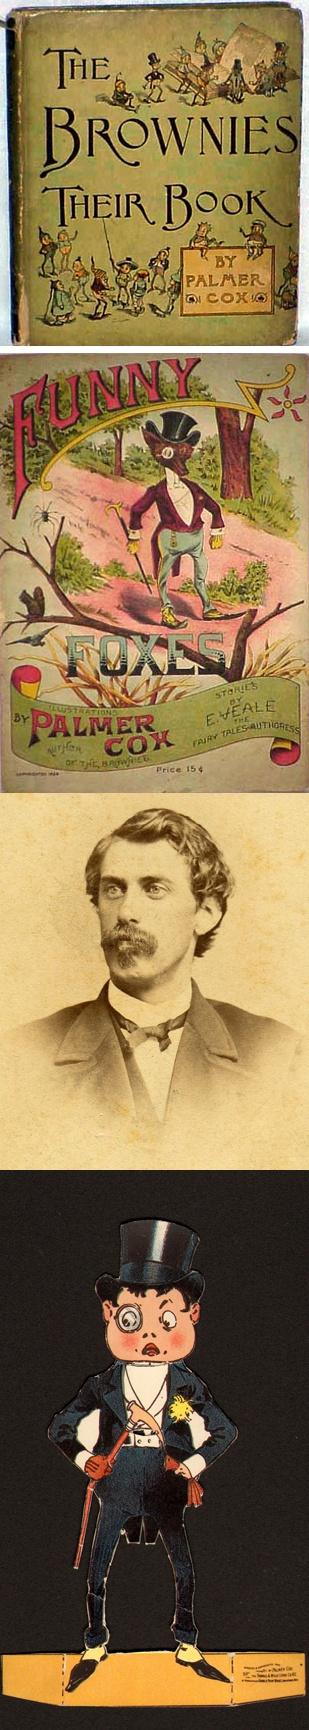 Palmer Cox - Brownie